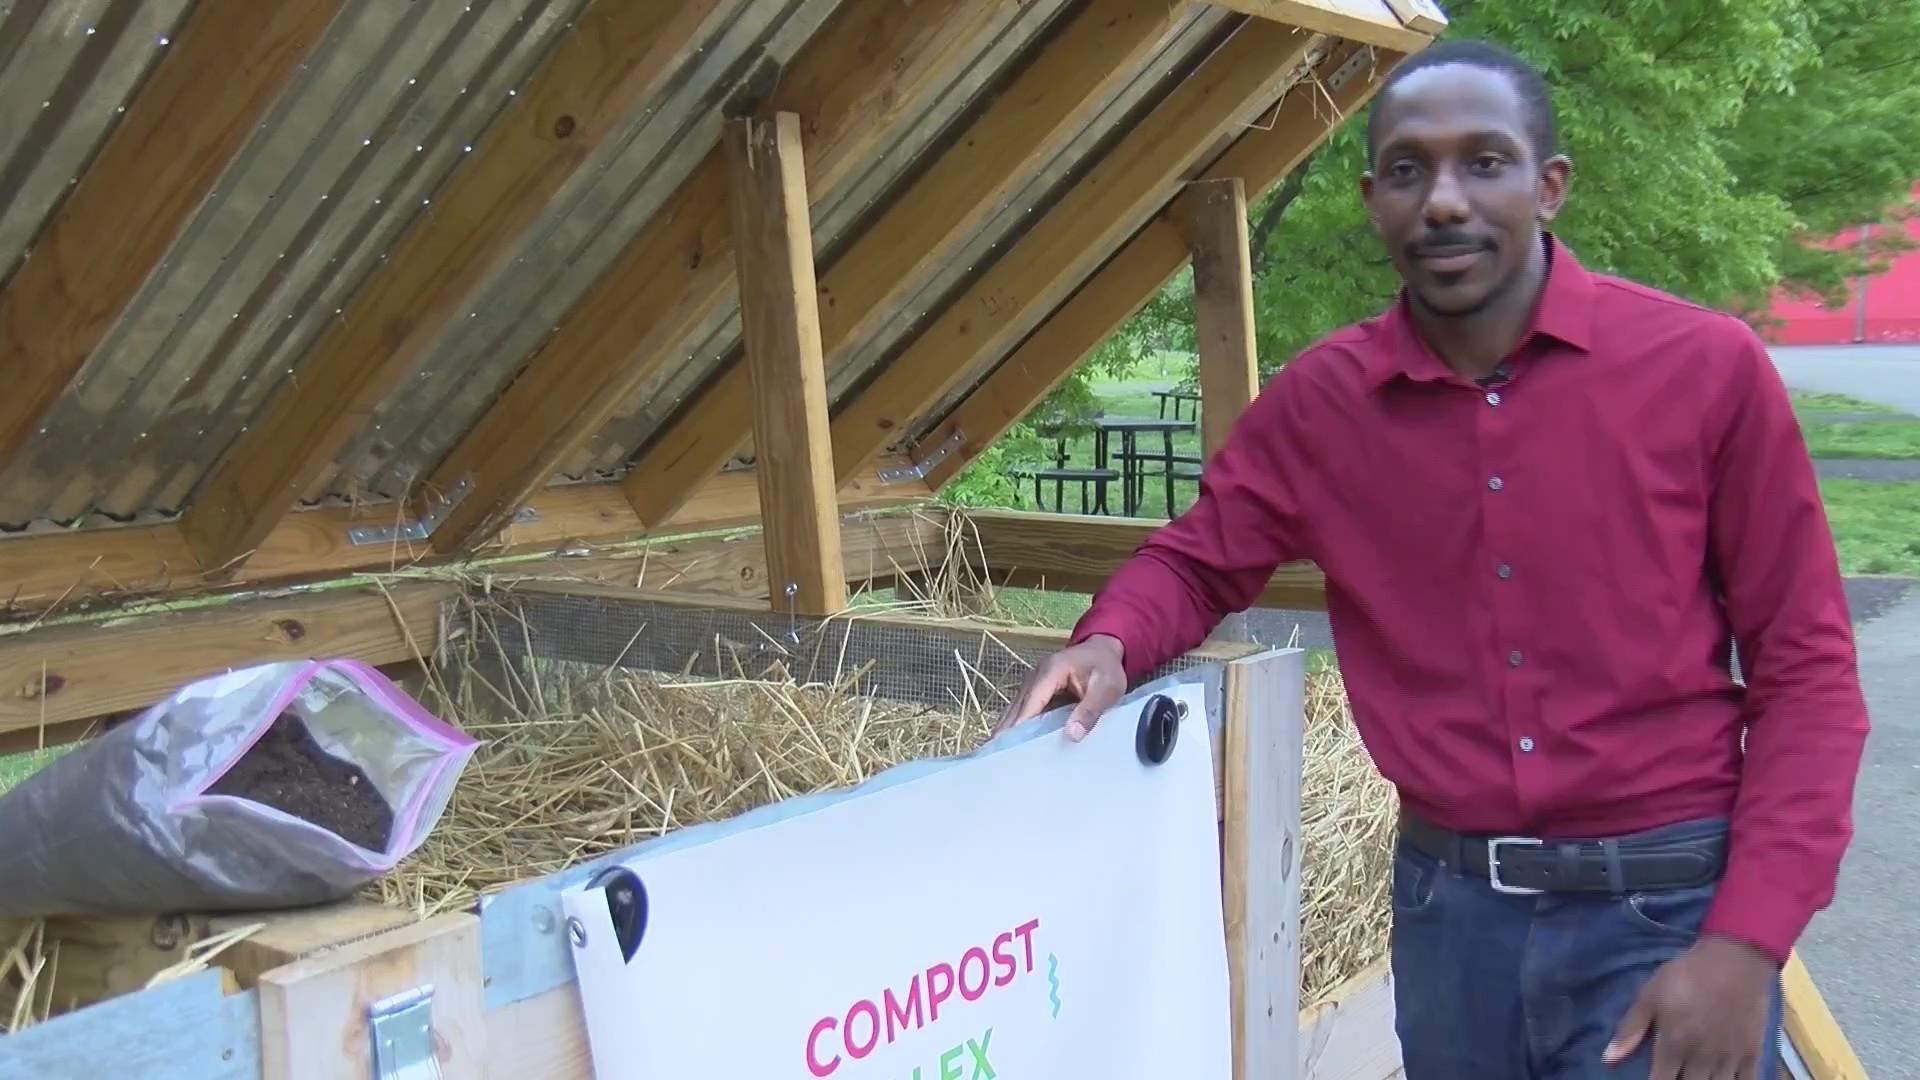 Composting_Northern_Va_0_20190426233734